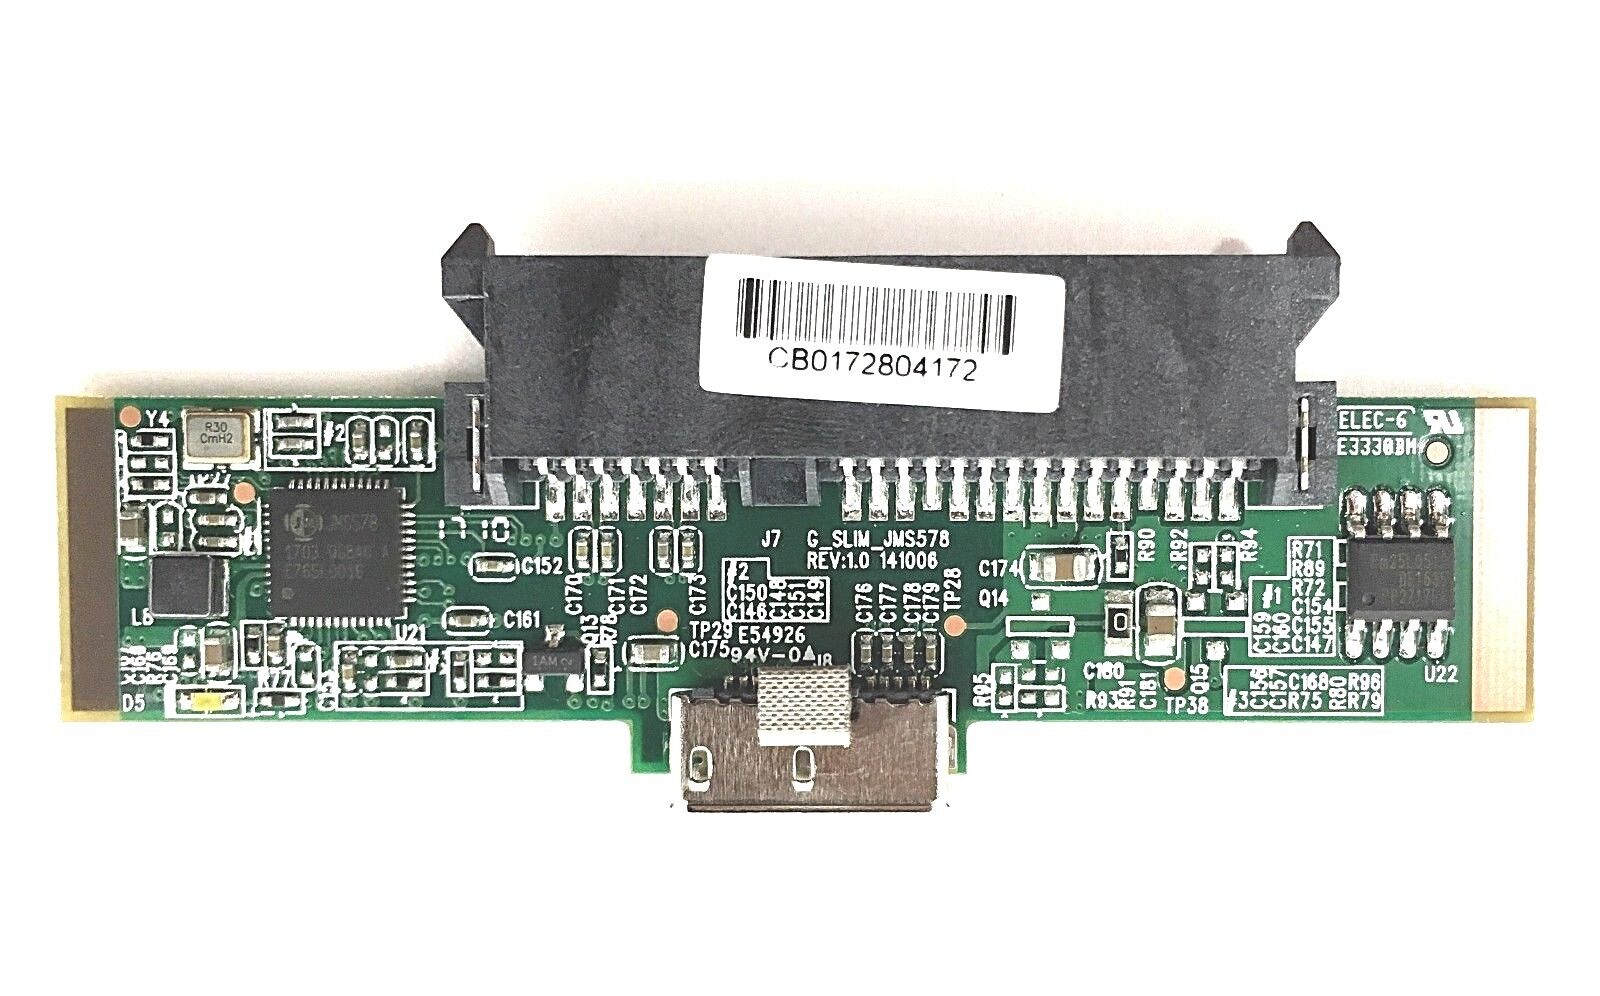 G-DRIVE Enclosure PCB G/_SLIM/_JMS578 Adapter Thunderbolt USB3 USB-C Cable